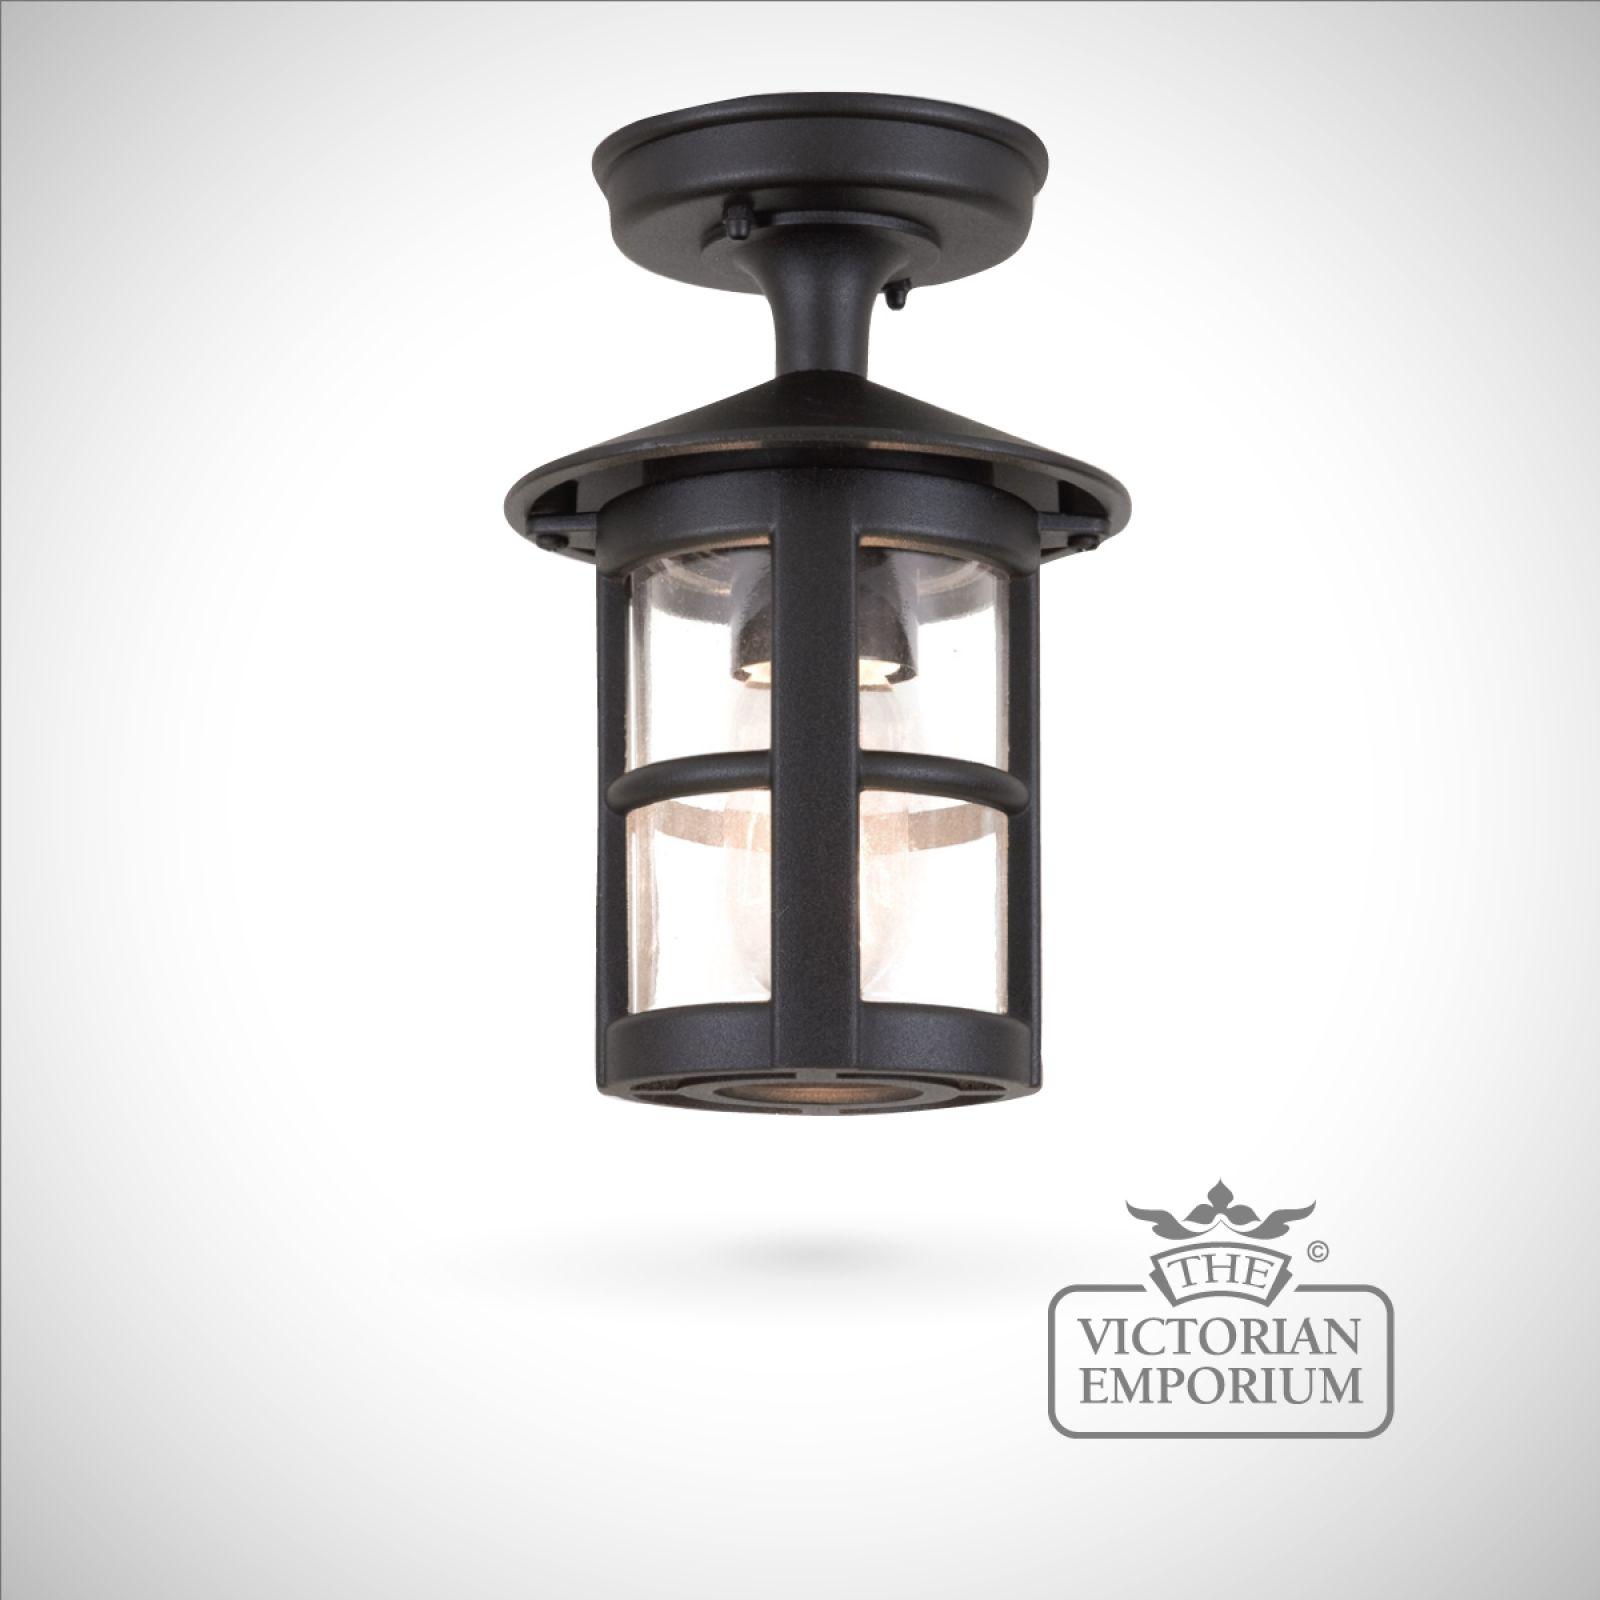 Hereford Plain Rigid Tube Lantern Exterior Ceiling Lights